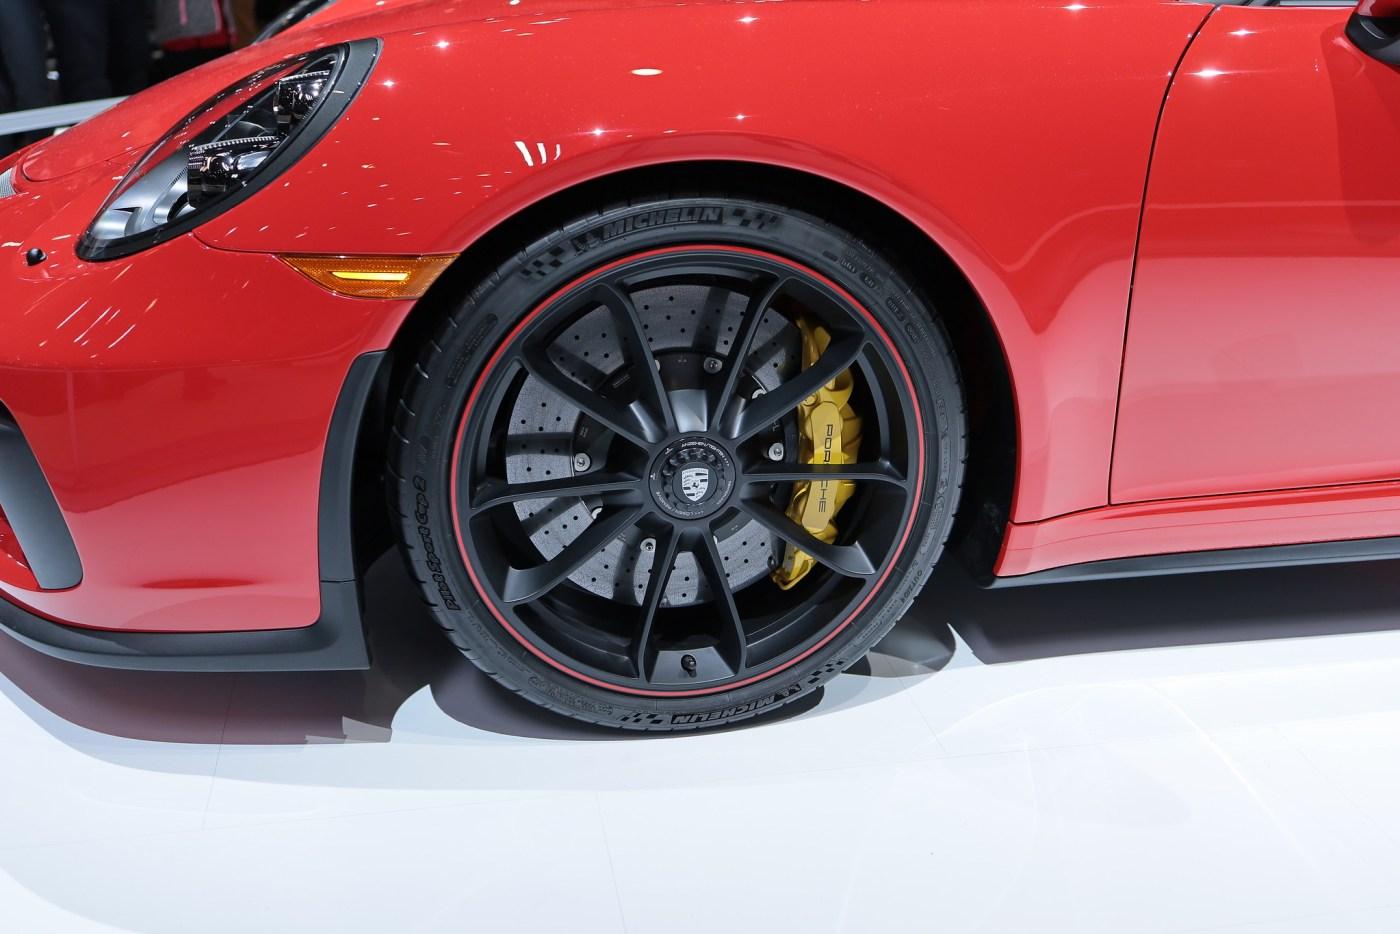 2019 Porsche 911 Speedster wheel close-up